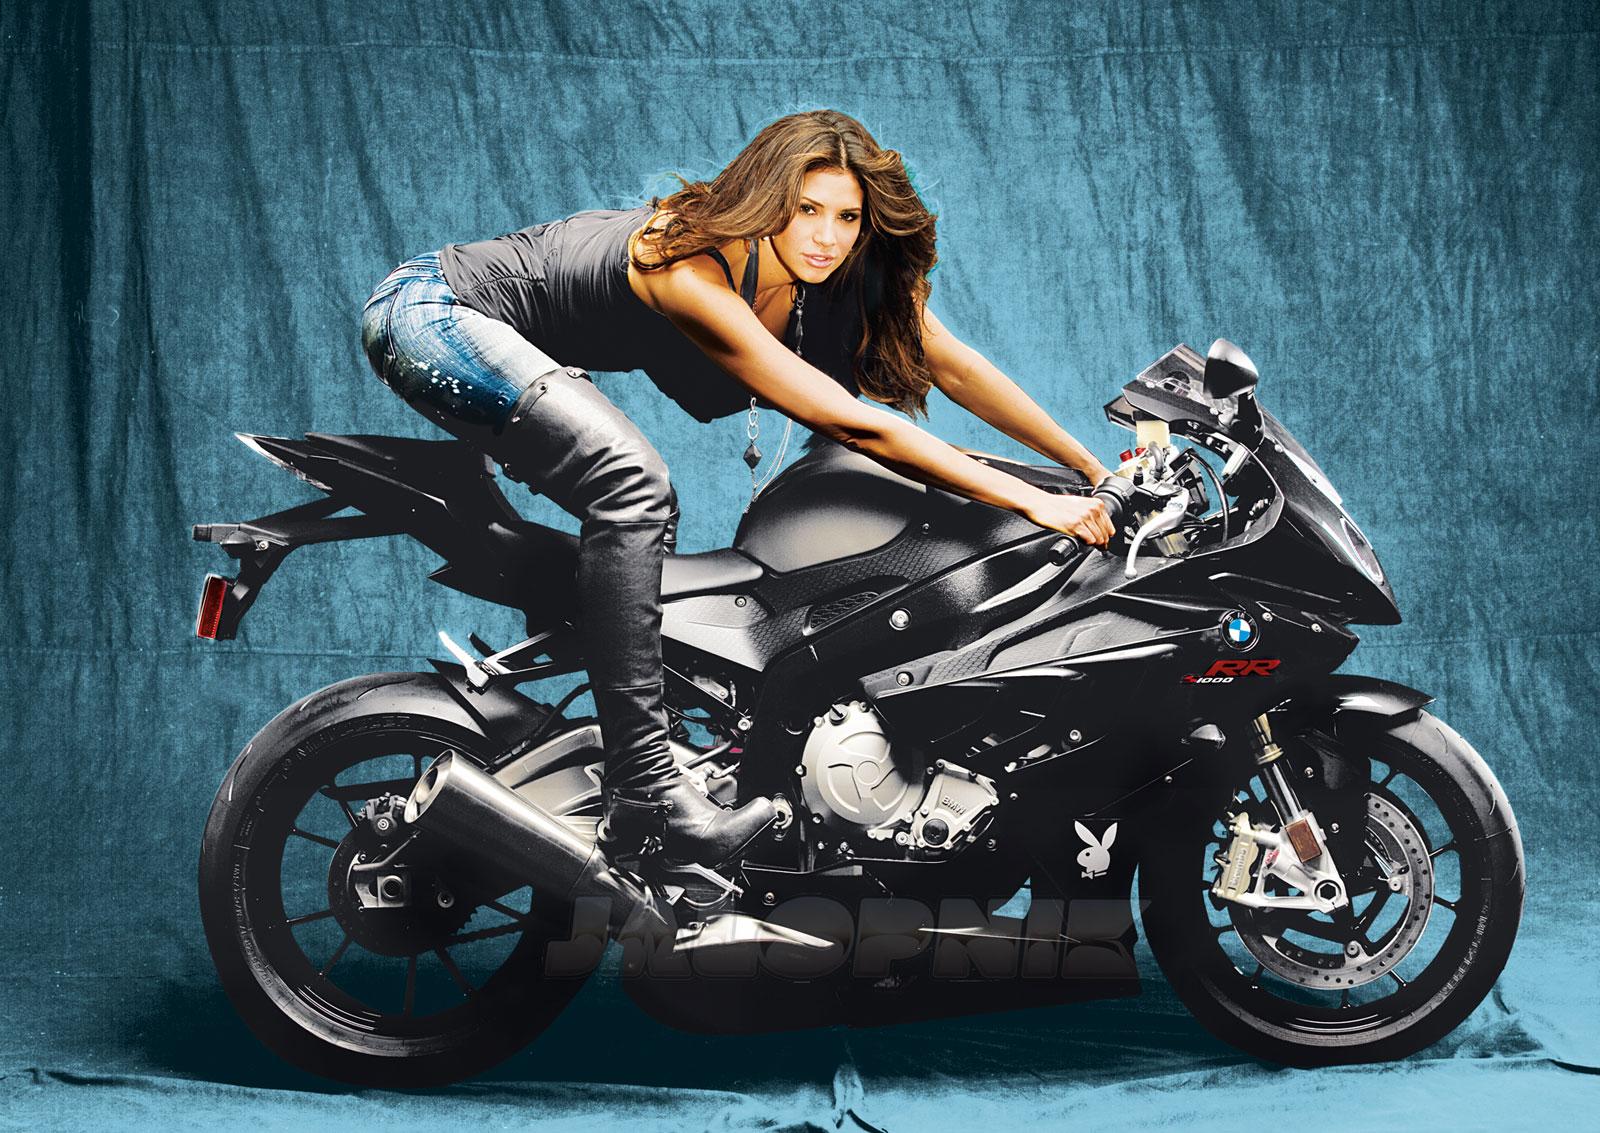 super bikes girl hope dworaczyk a cool bmw motorbike